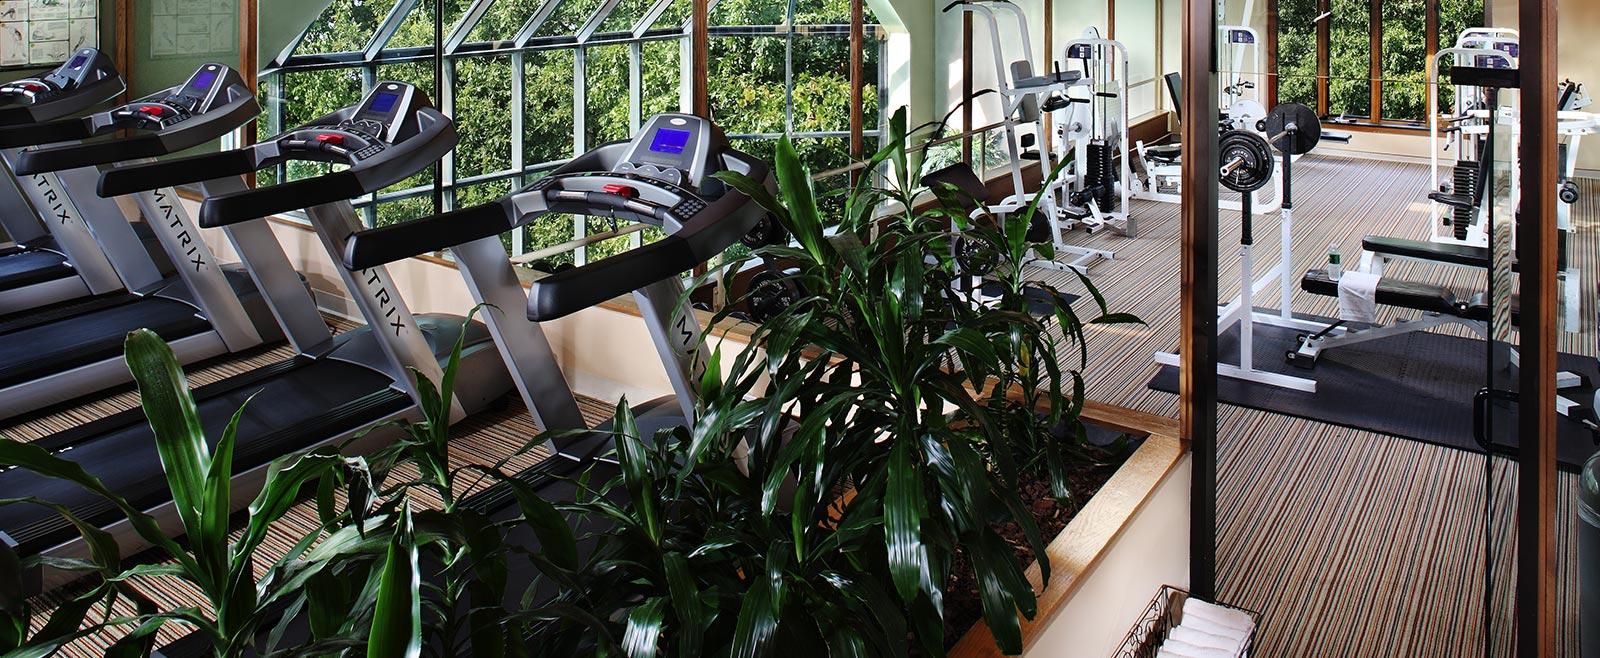 amenities-at-tarrytown-house-estate-top.jpg